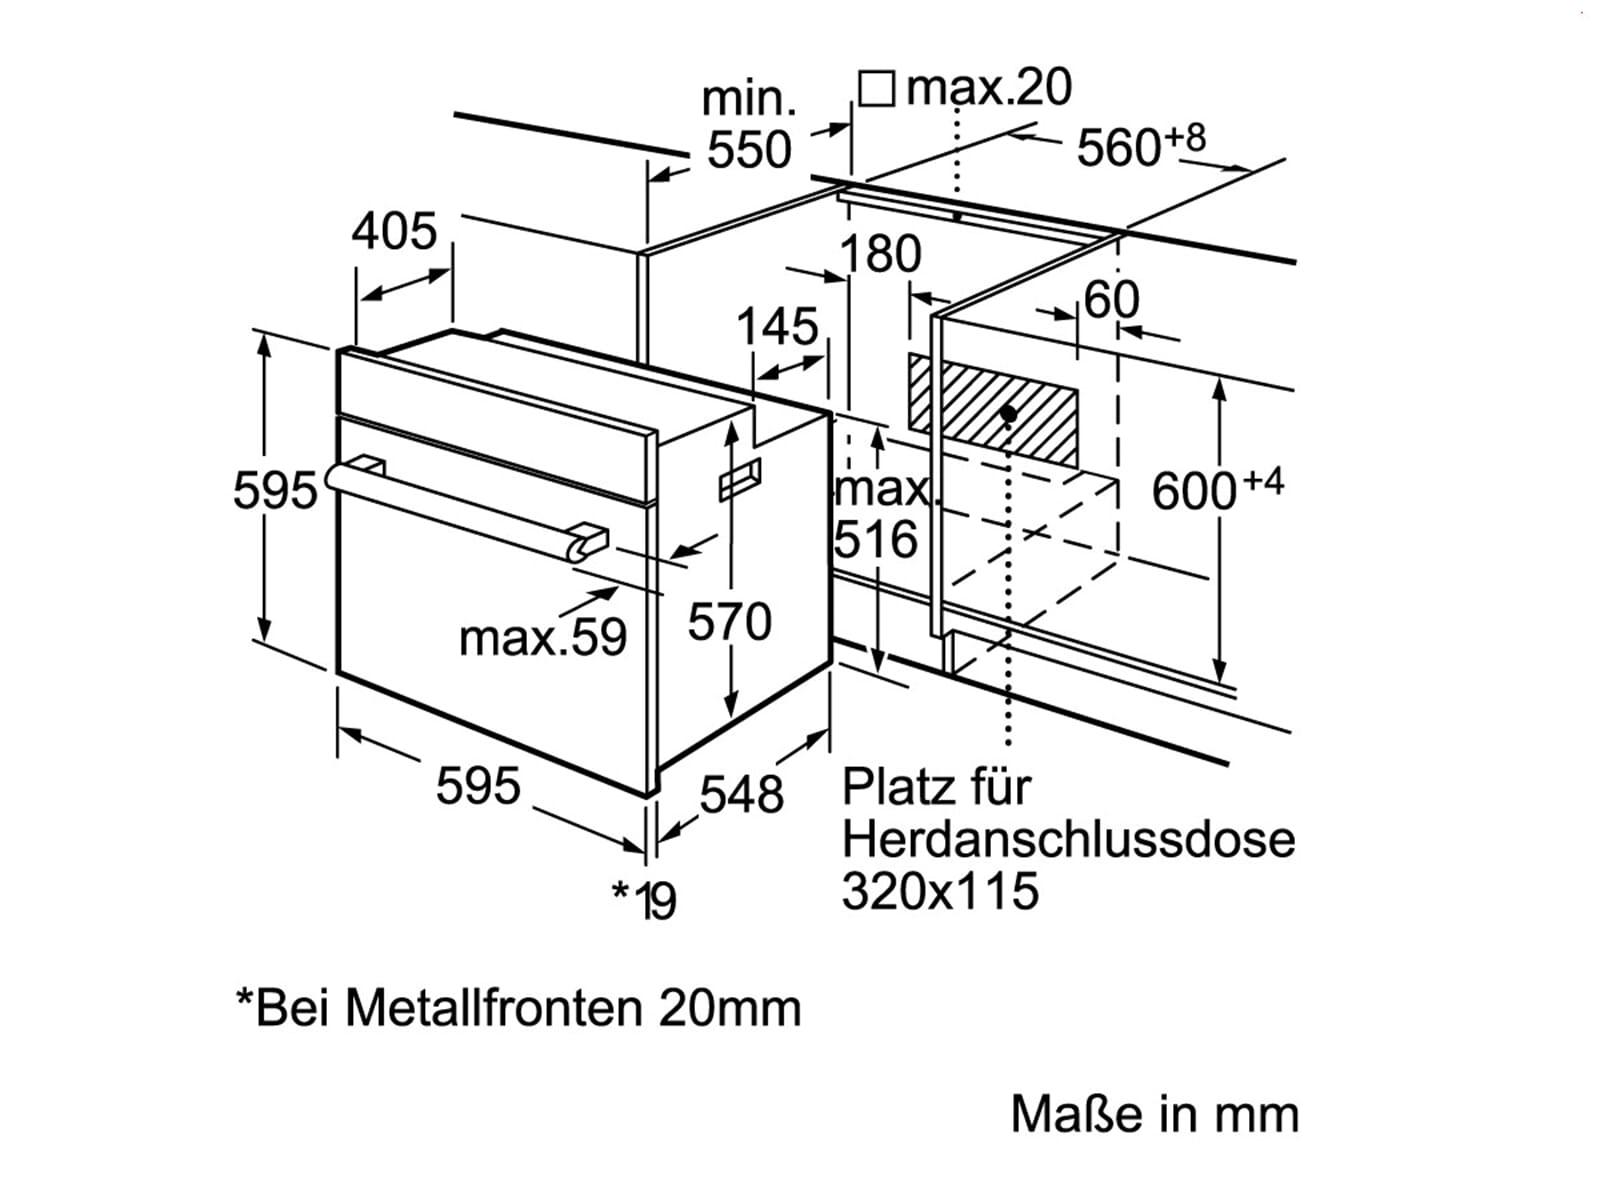 bosch hnd72ps50 set pyrolyse einbauherd heg73u150 glaskeramik kochfeld nkn645g ebay. Black Bedroom Furniture Sets. Home Design Ideas